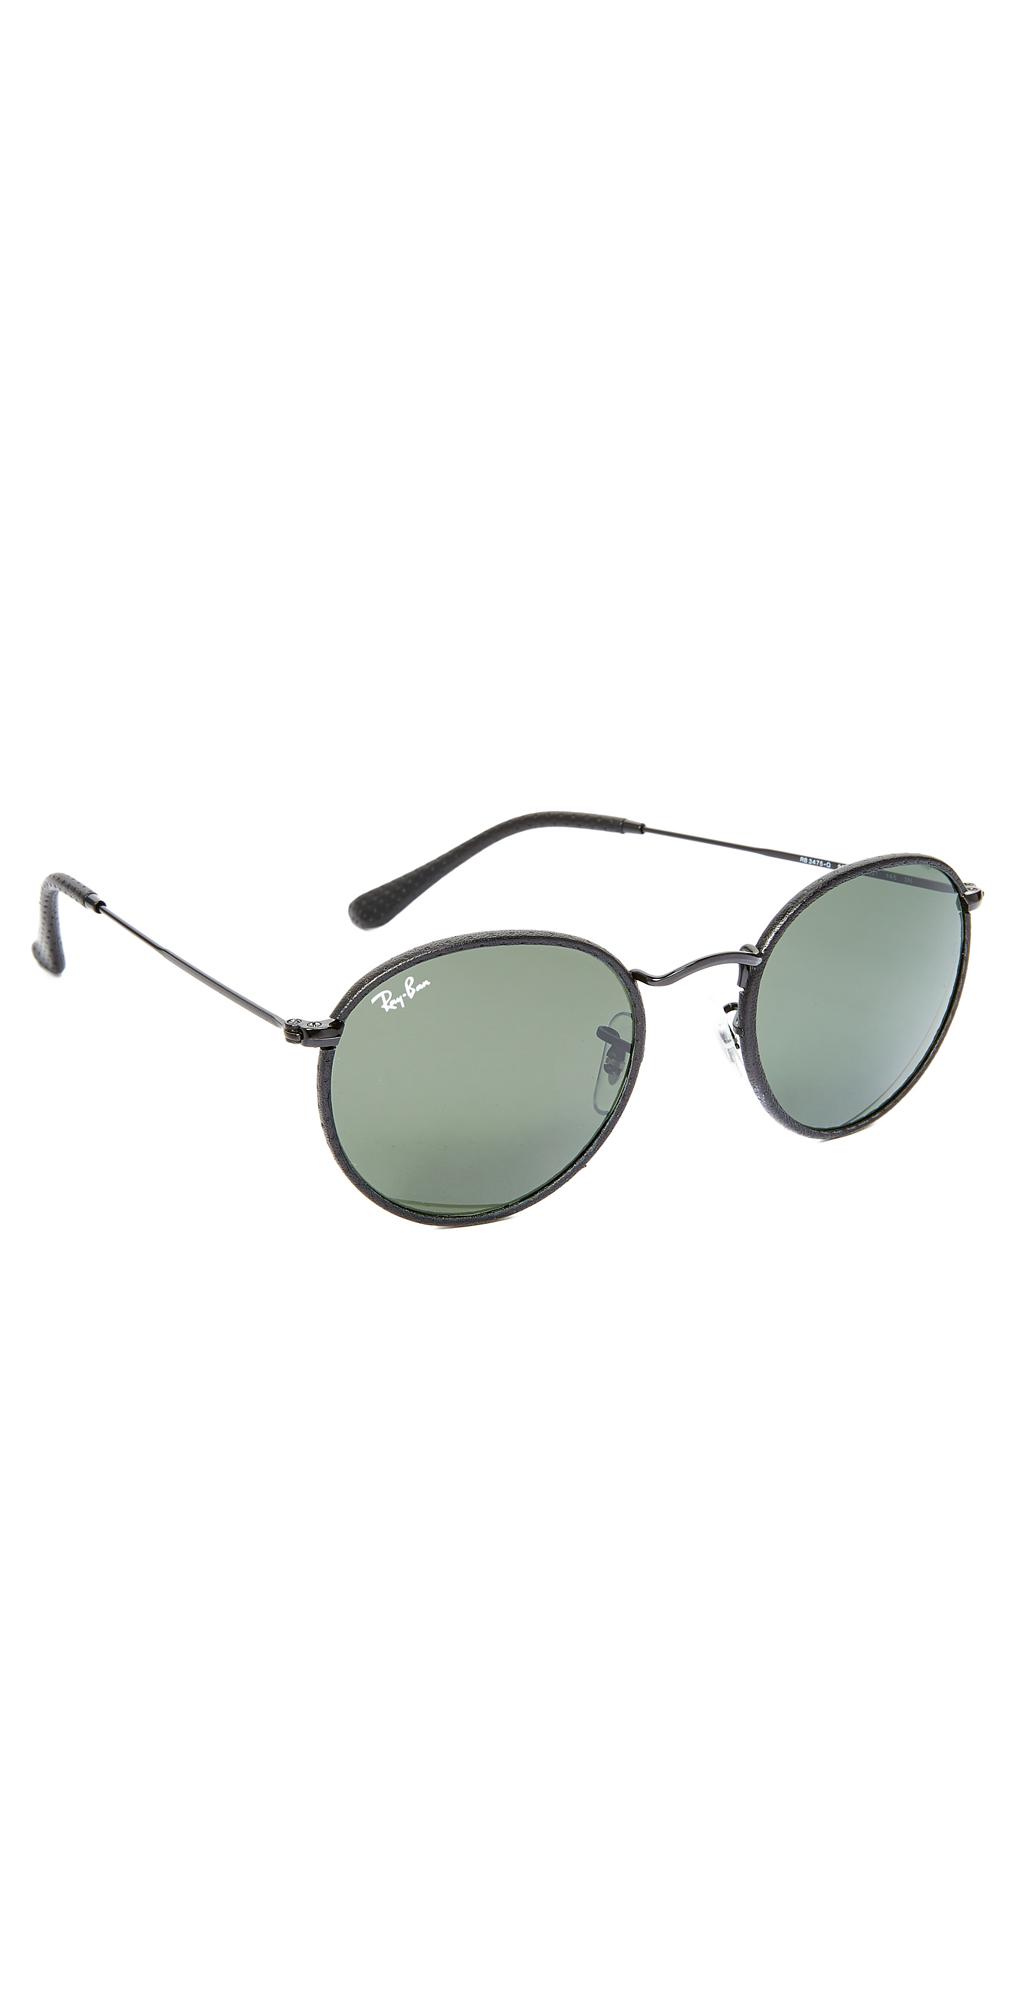 Phantos Round Leather Sunglasses Ray-Ban